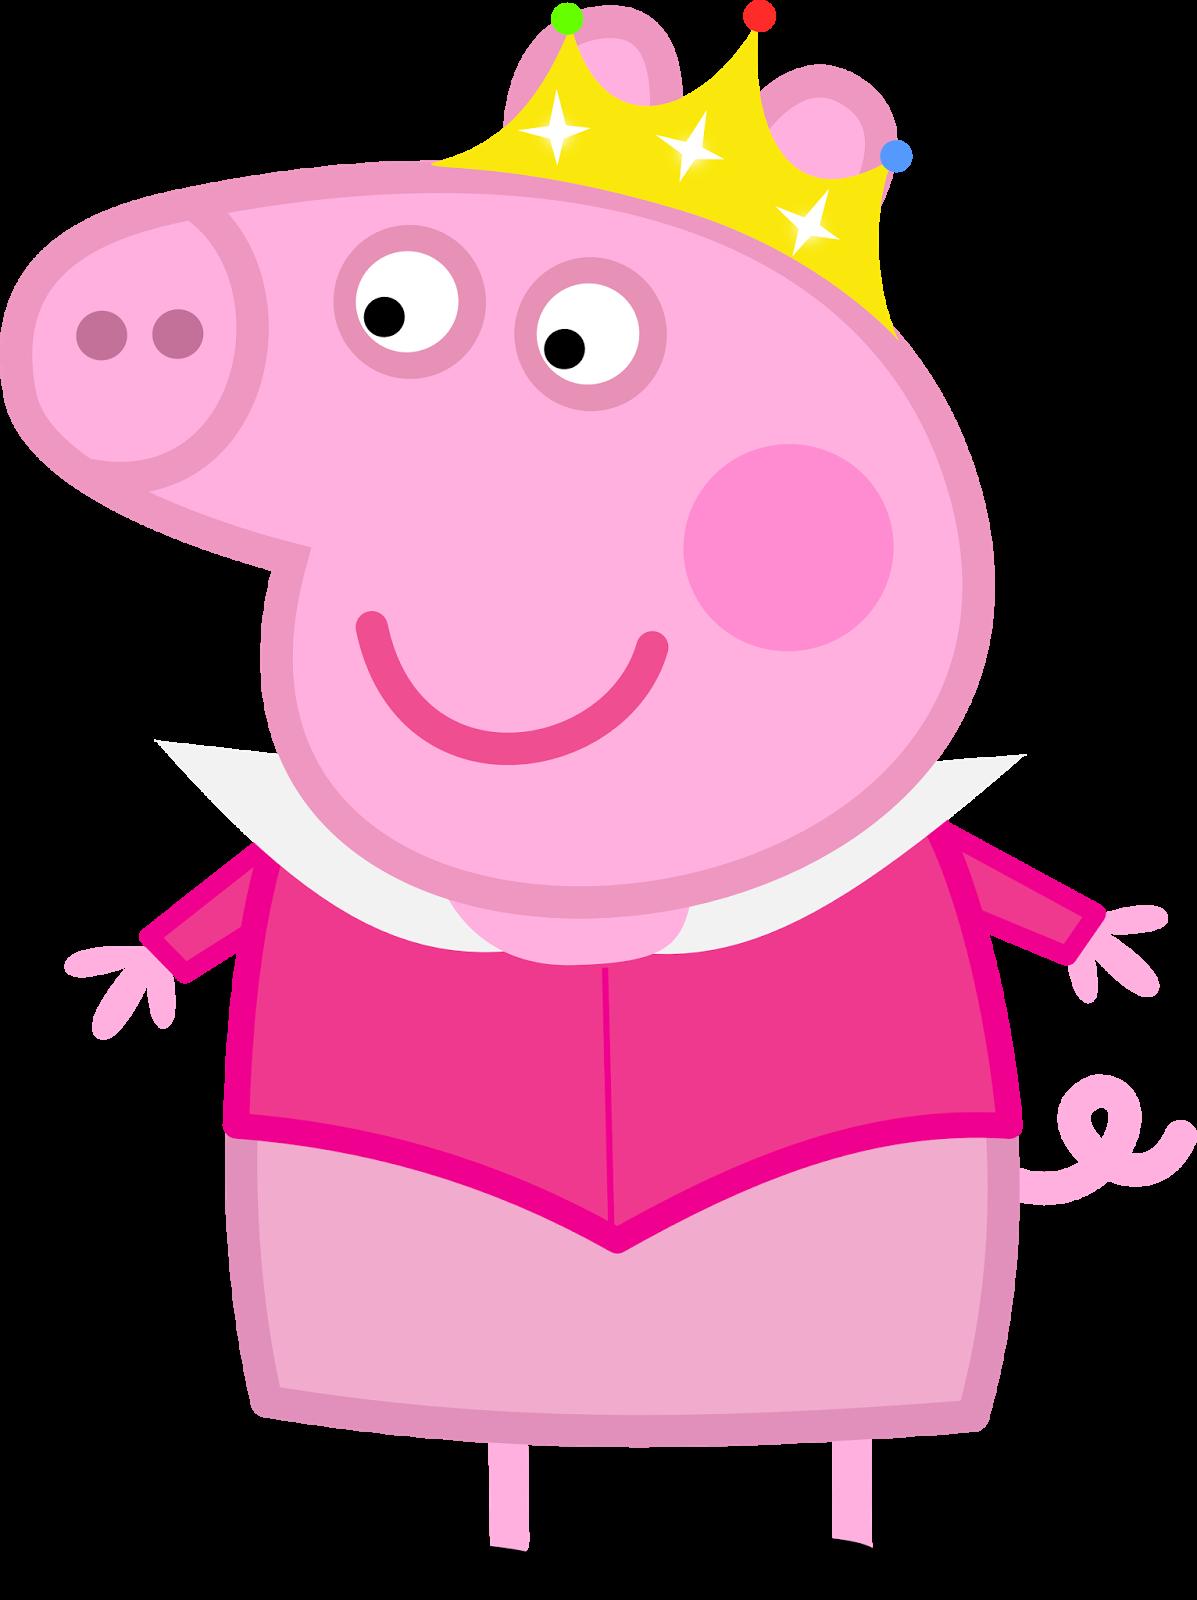 Nd Peppapigprincess 4 Png 1197 1600 Peppa Pig Pig Cartoon Pig